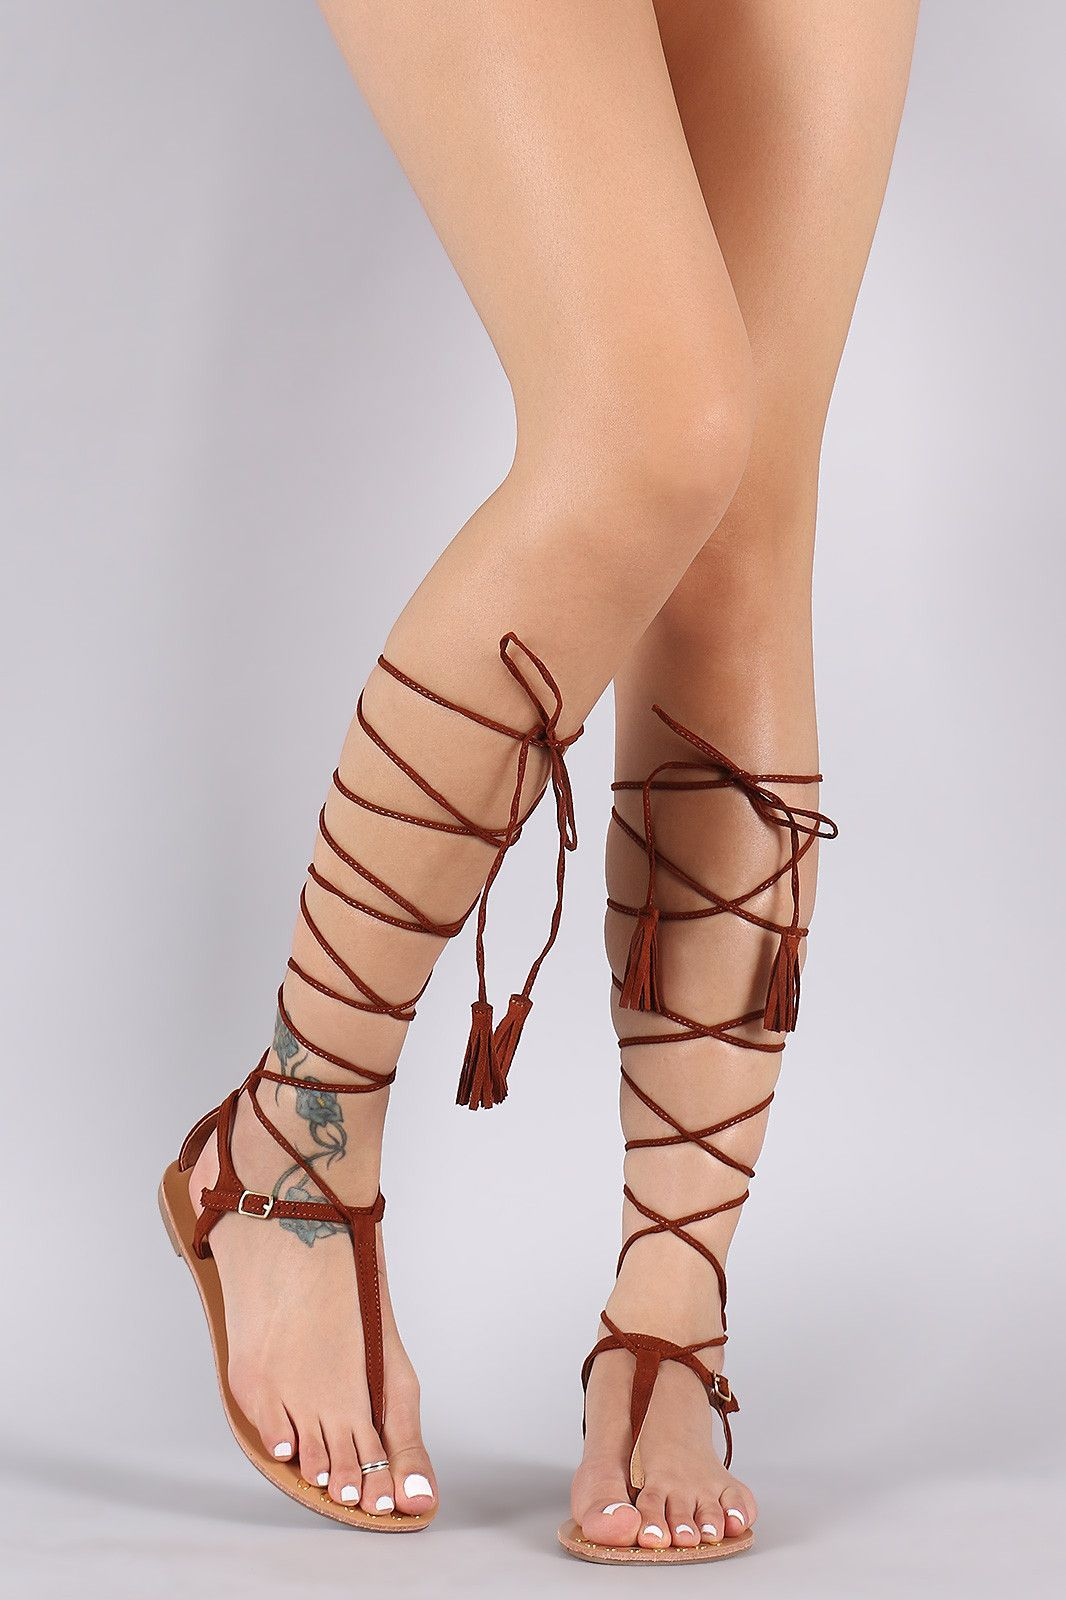 16e16eefb51dba Qupid Studded T-Strap Tassel Lace-Up Flat Sandal Flat Gladiator Sandals